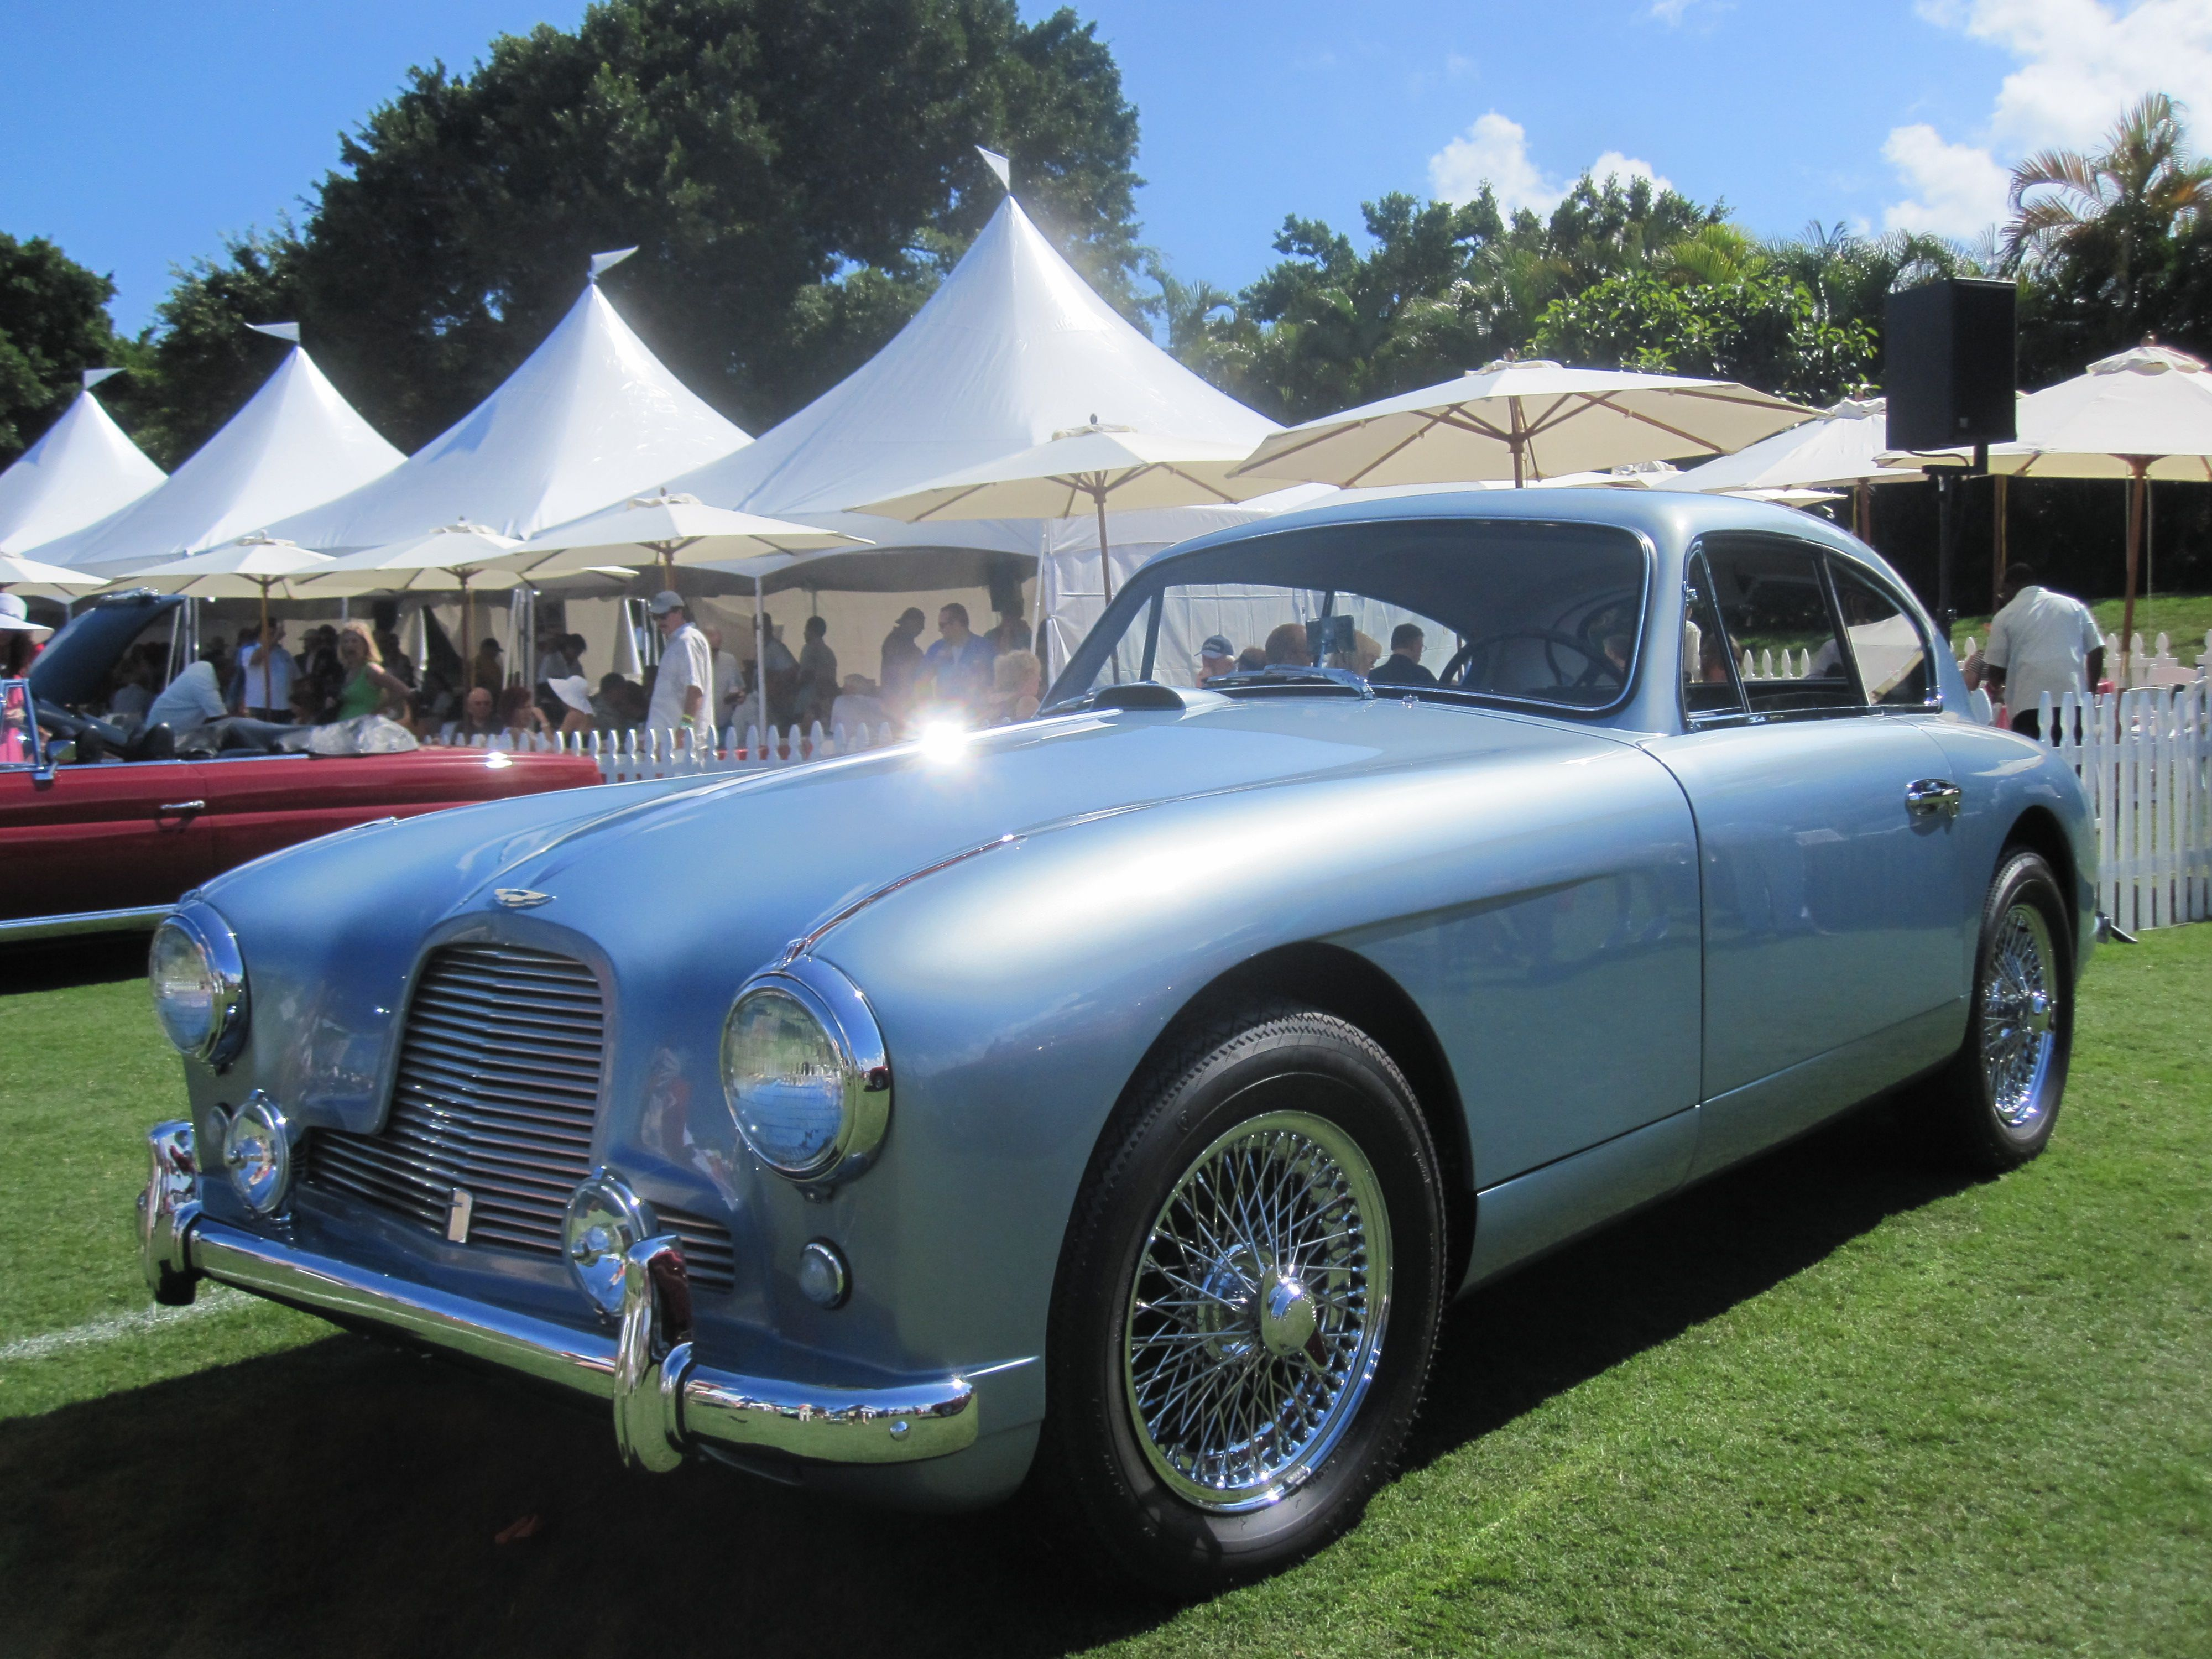 Vintage Aston Martin Redline Aston martin, Antique